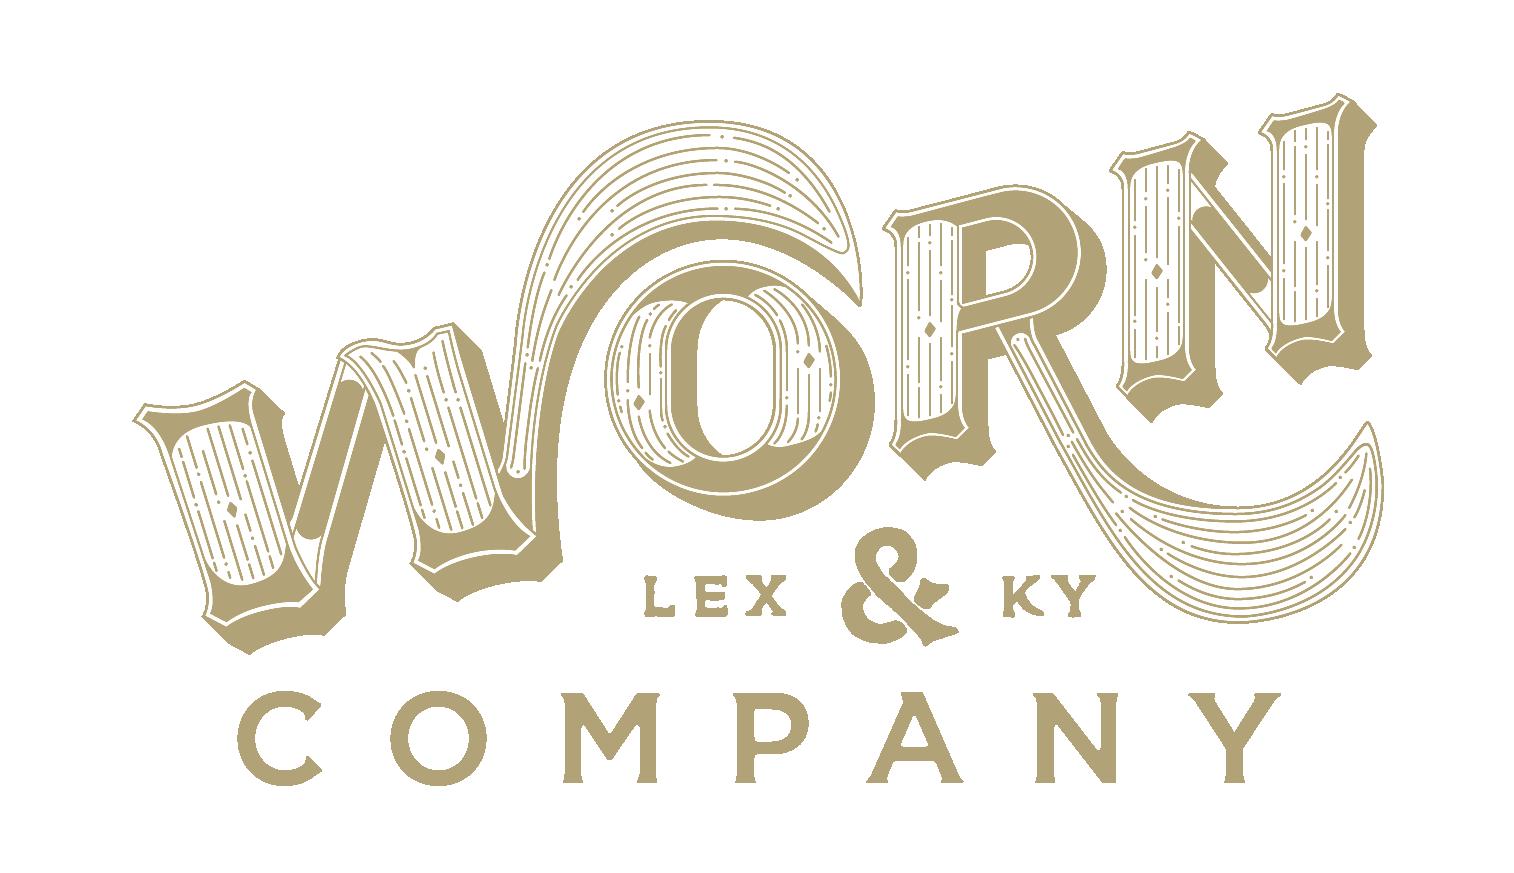 Worn & Company